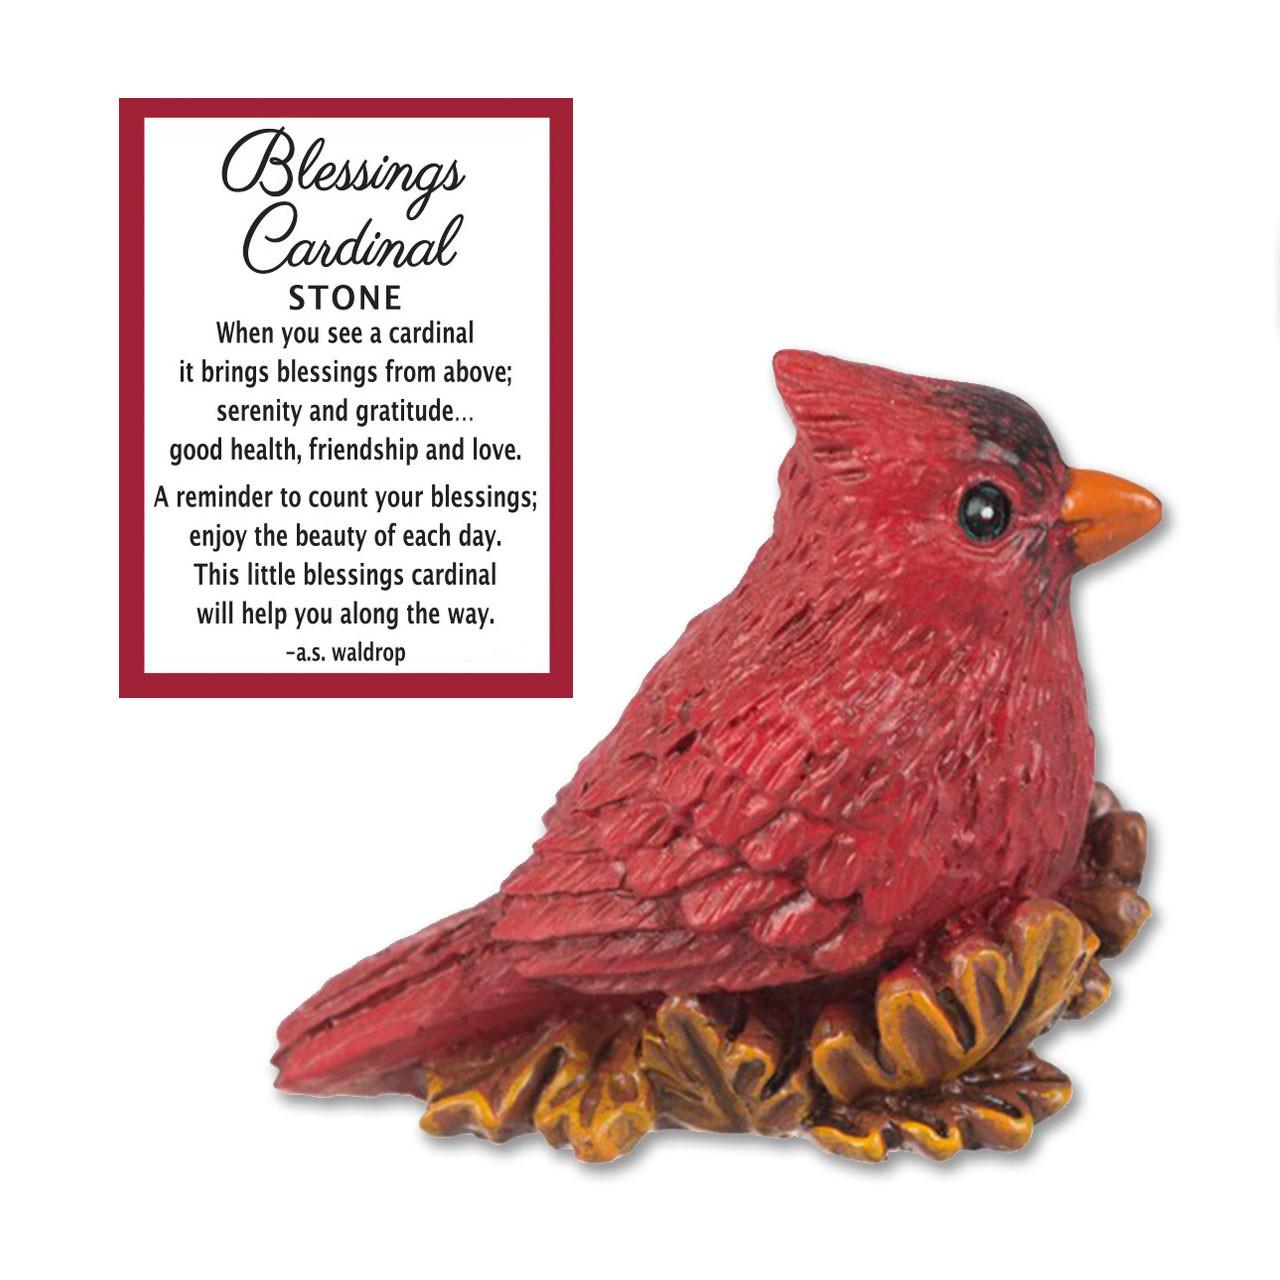 Blessings Cardinal Token